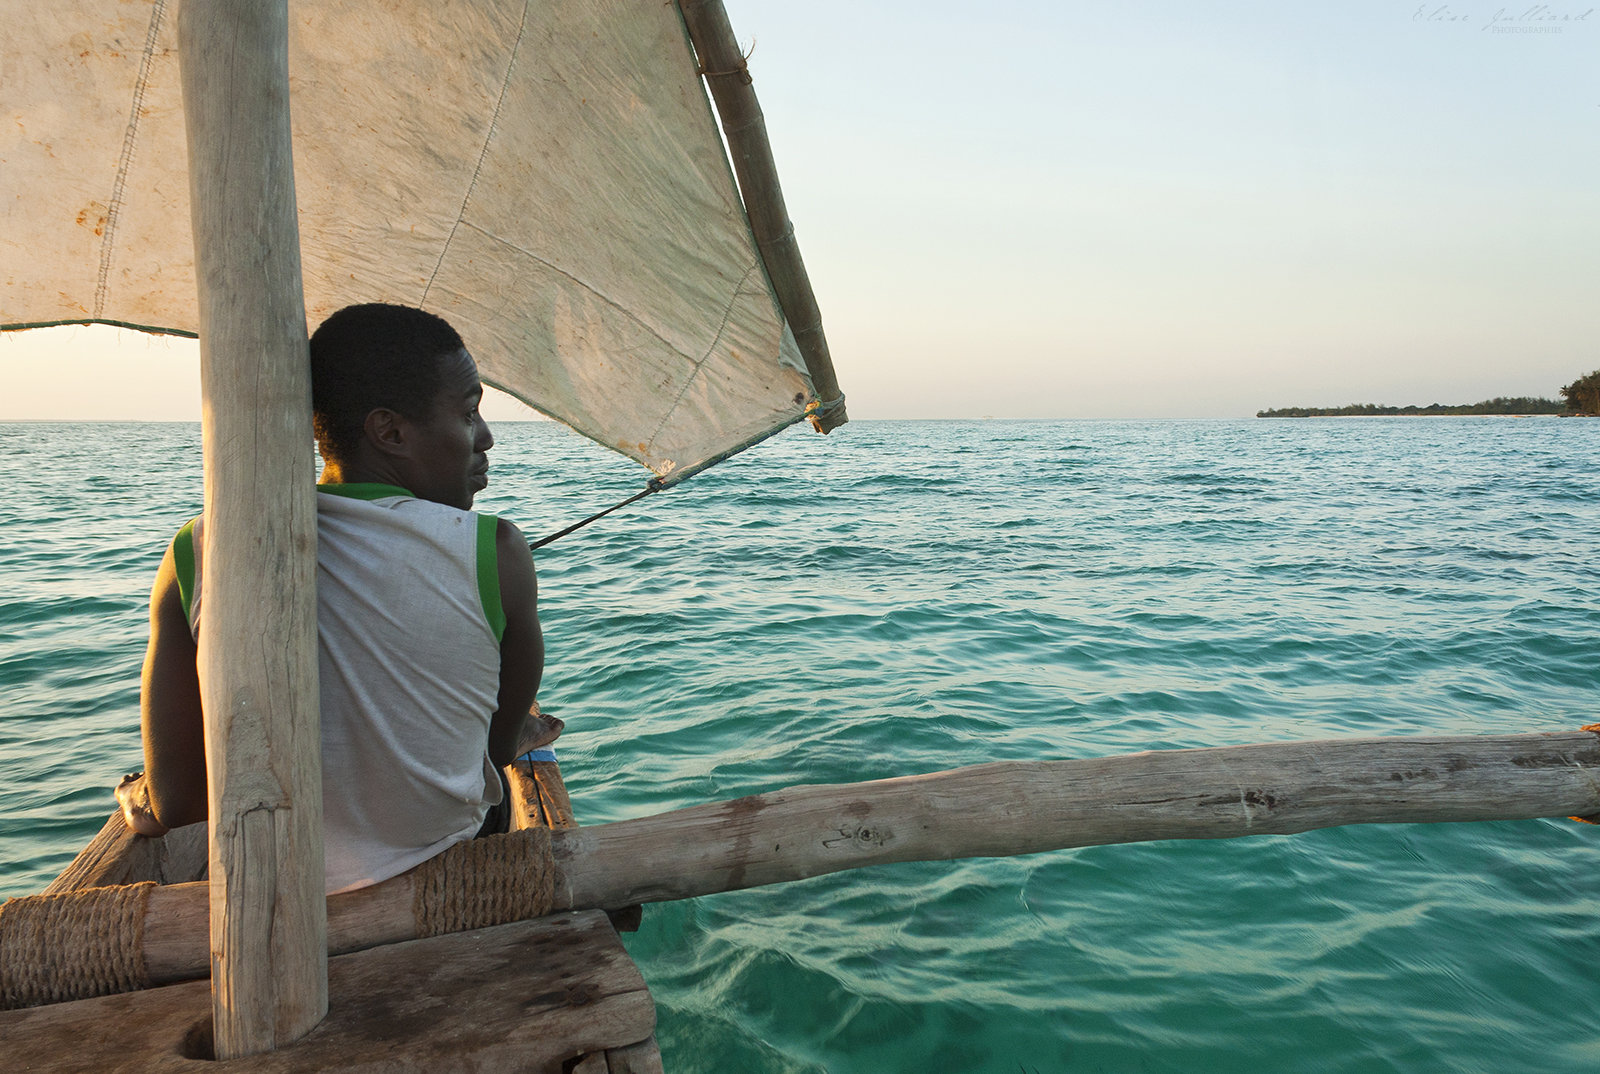 elise-julliard-photographe-photo-paysage-ocean-tanzanien-tanzanie-afrique-pirogue